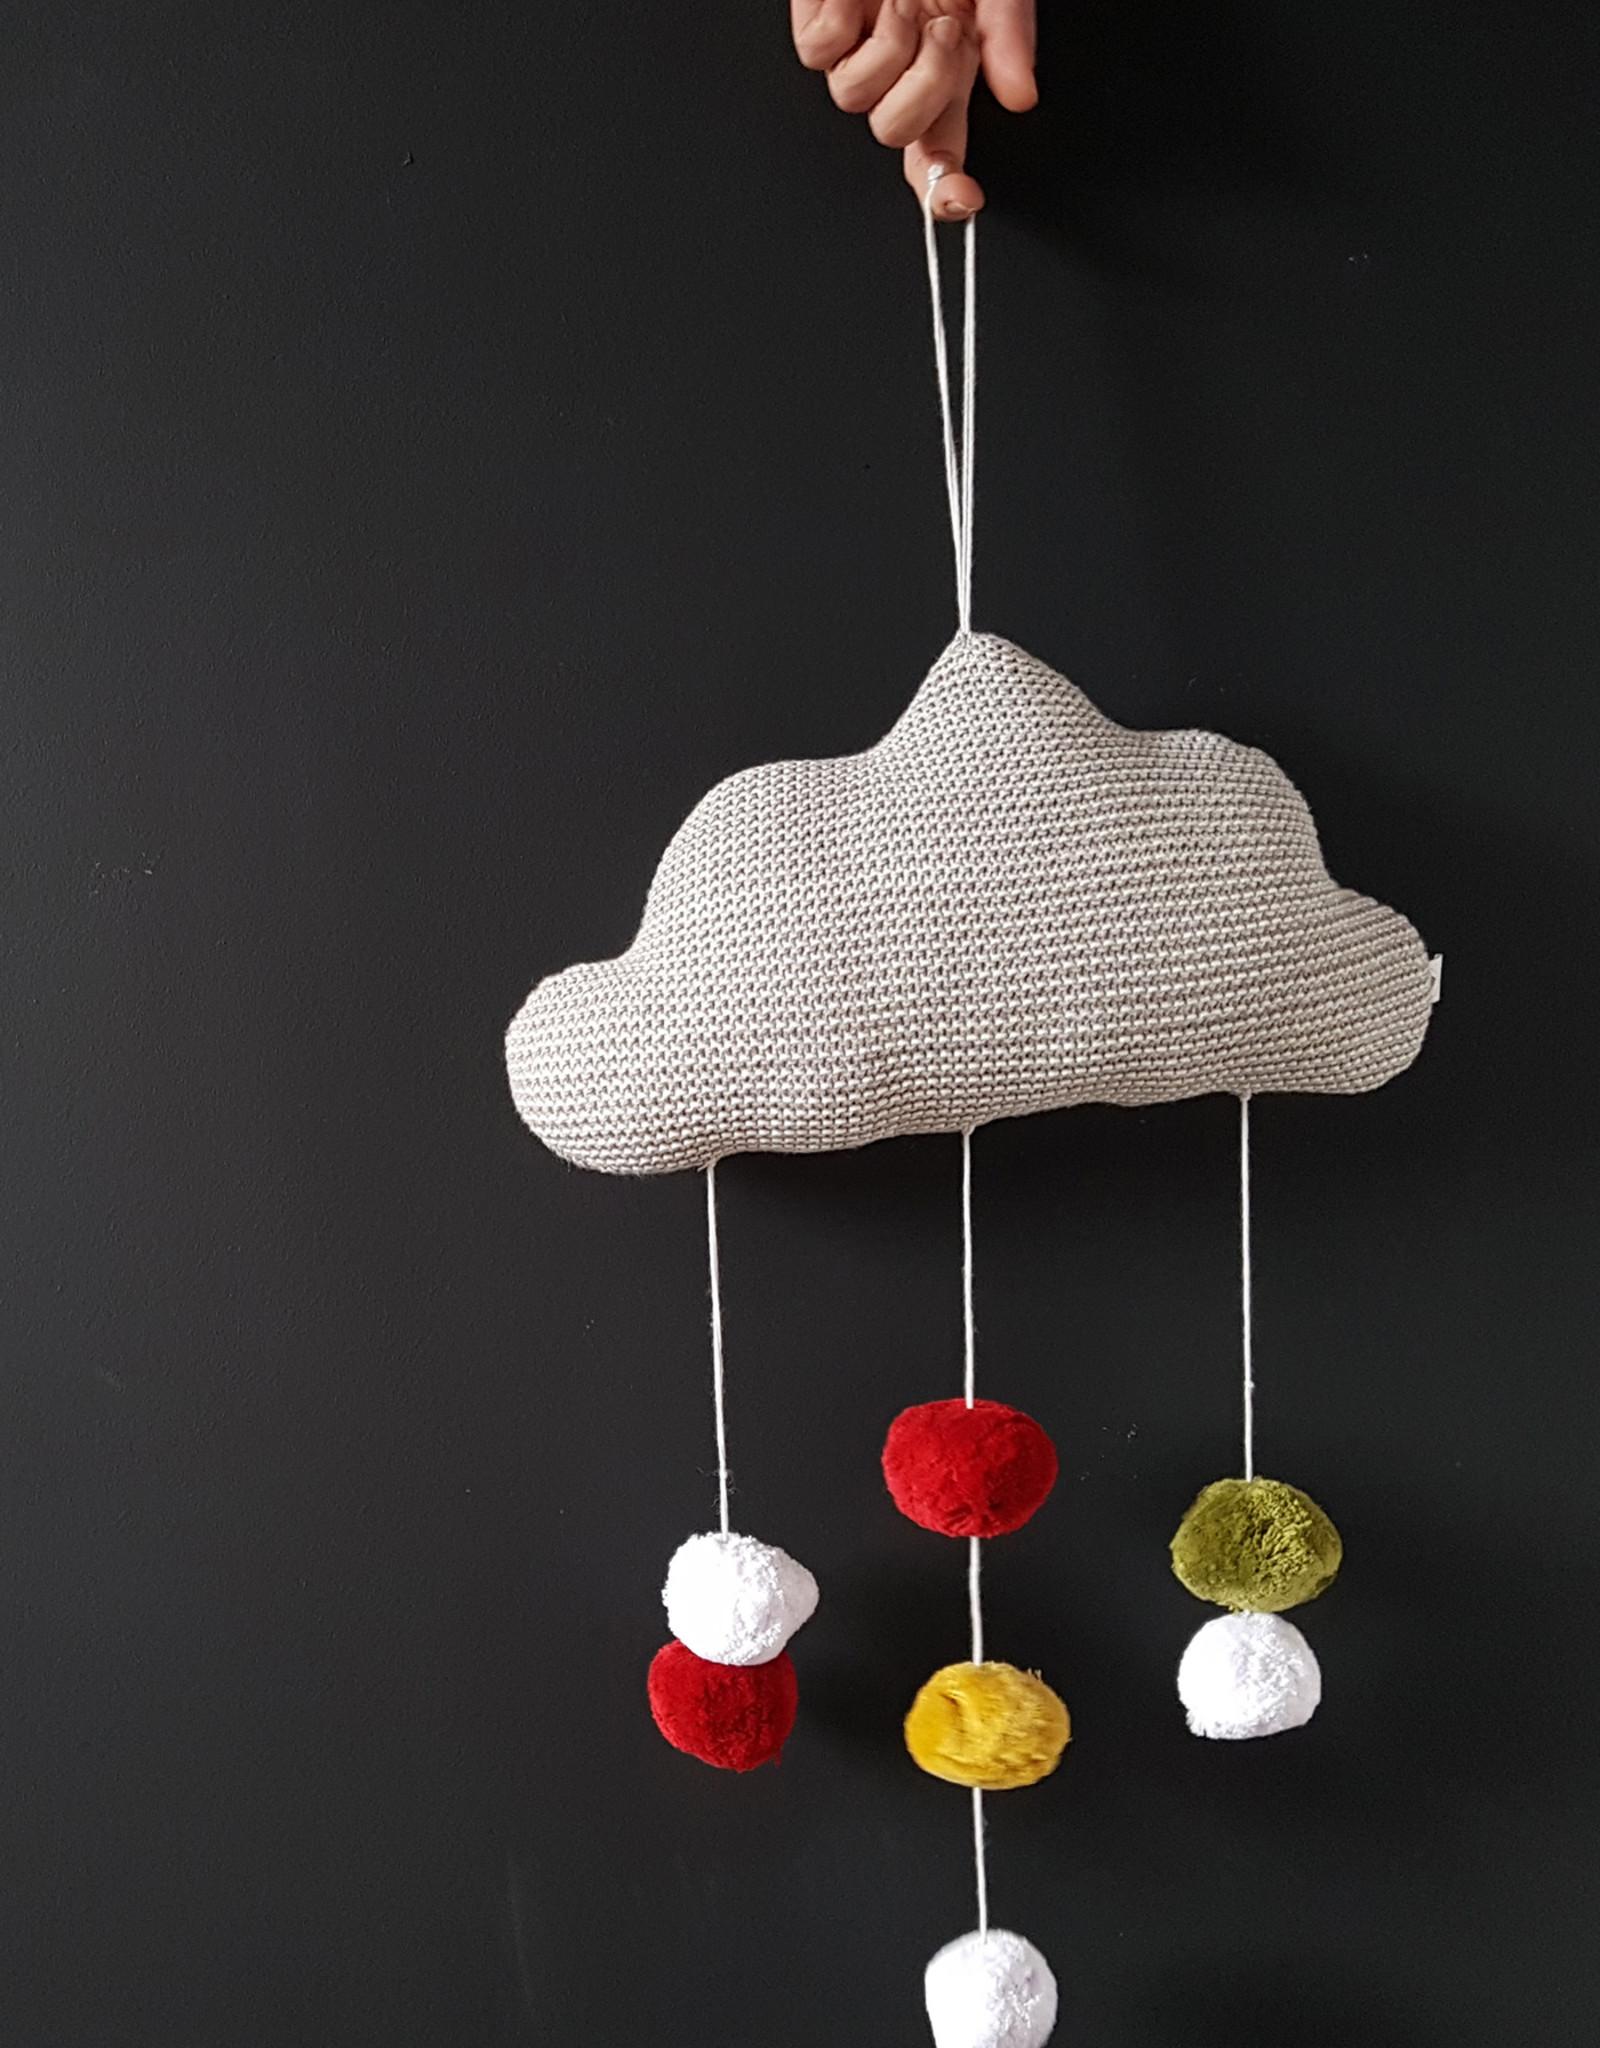 FABLIEK Fabliek - Hanging cloud pillow